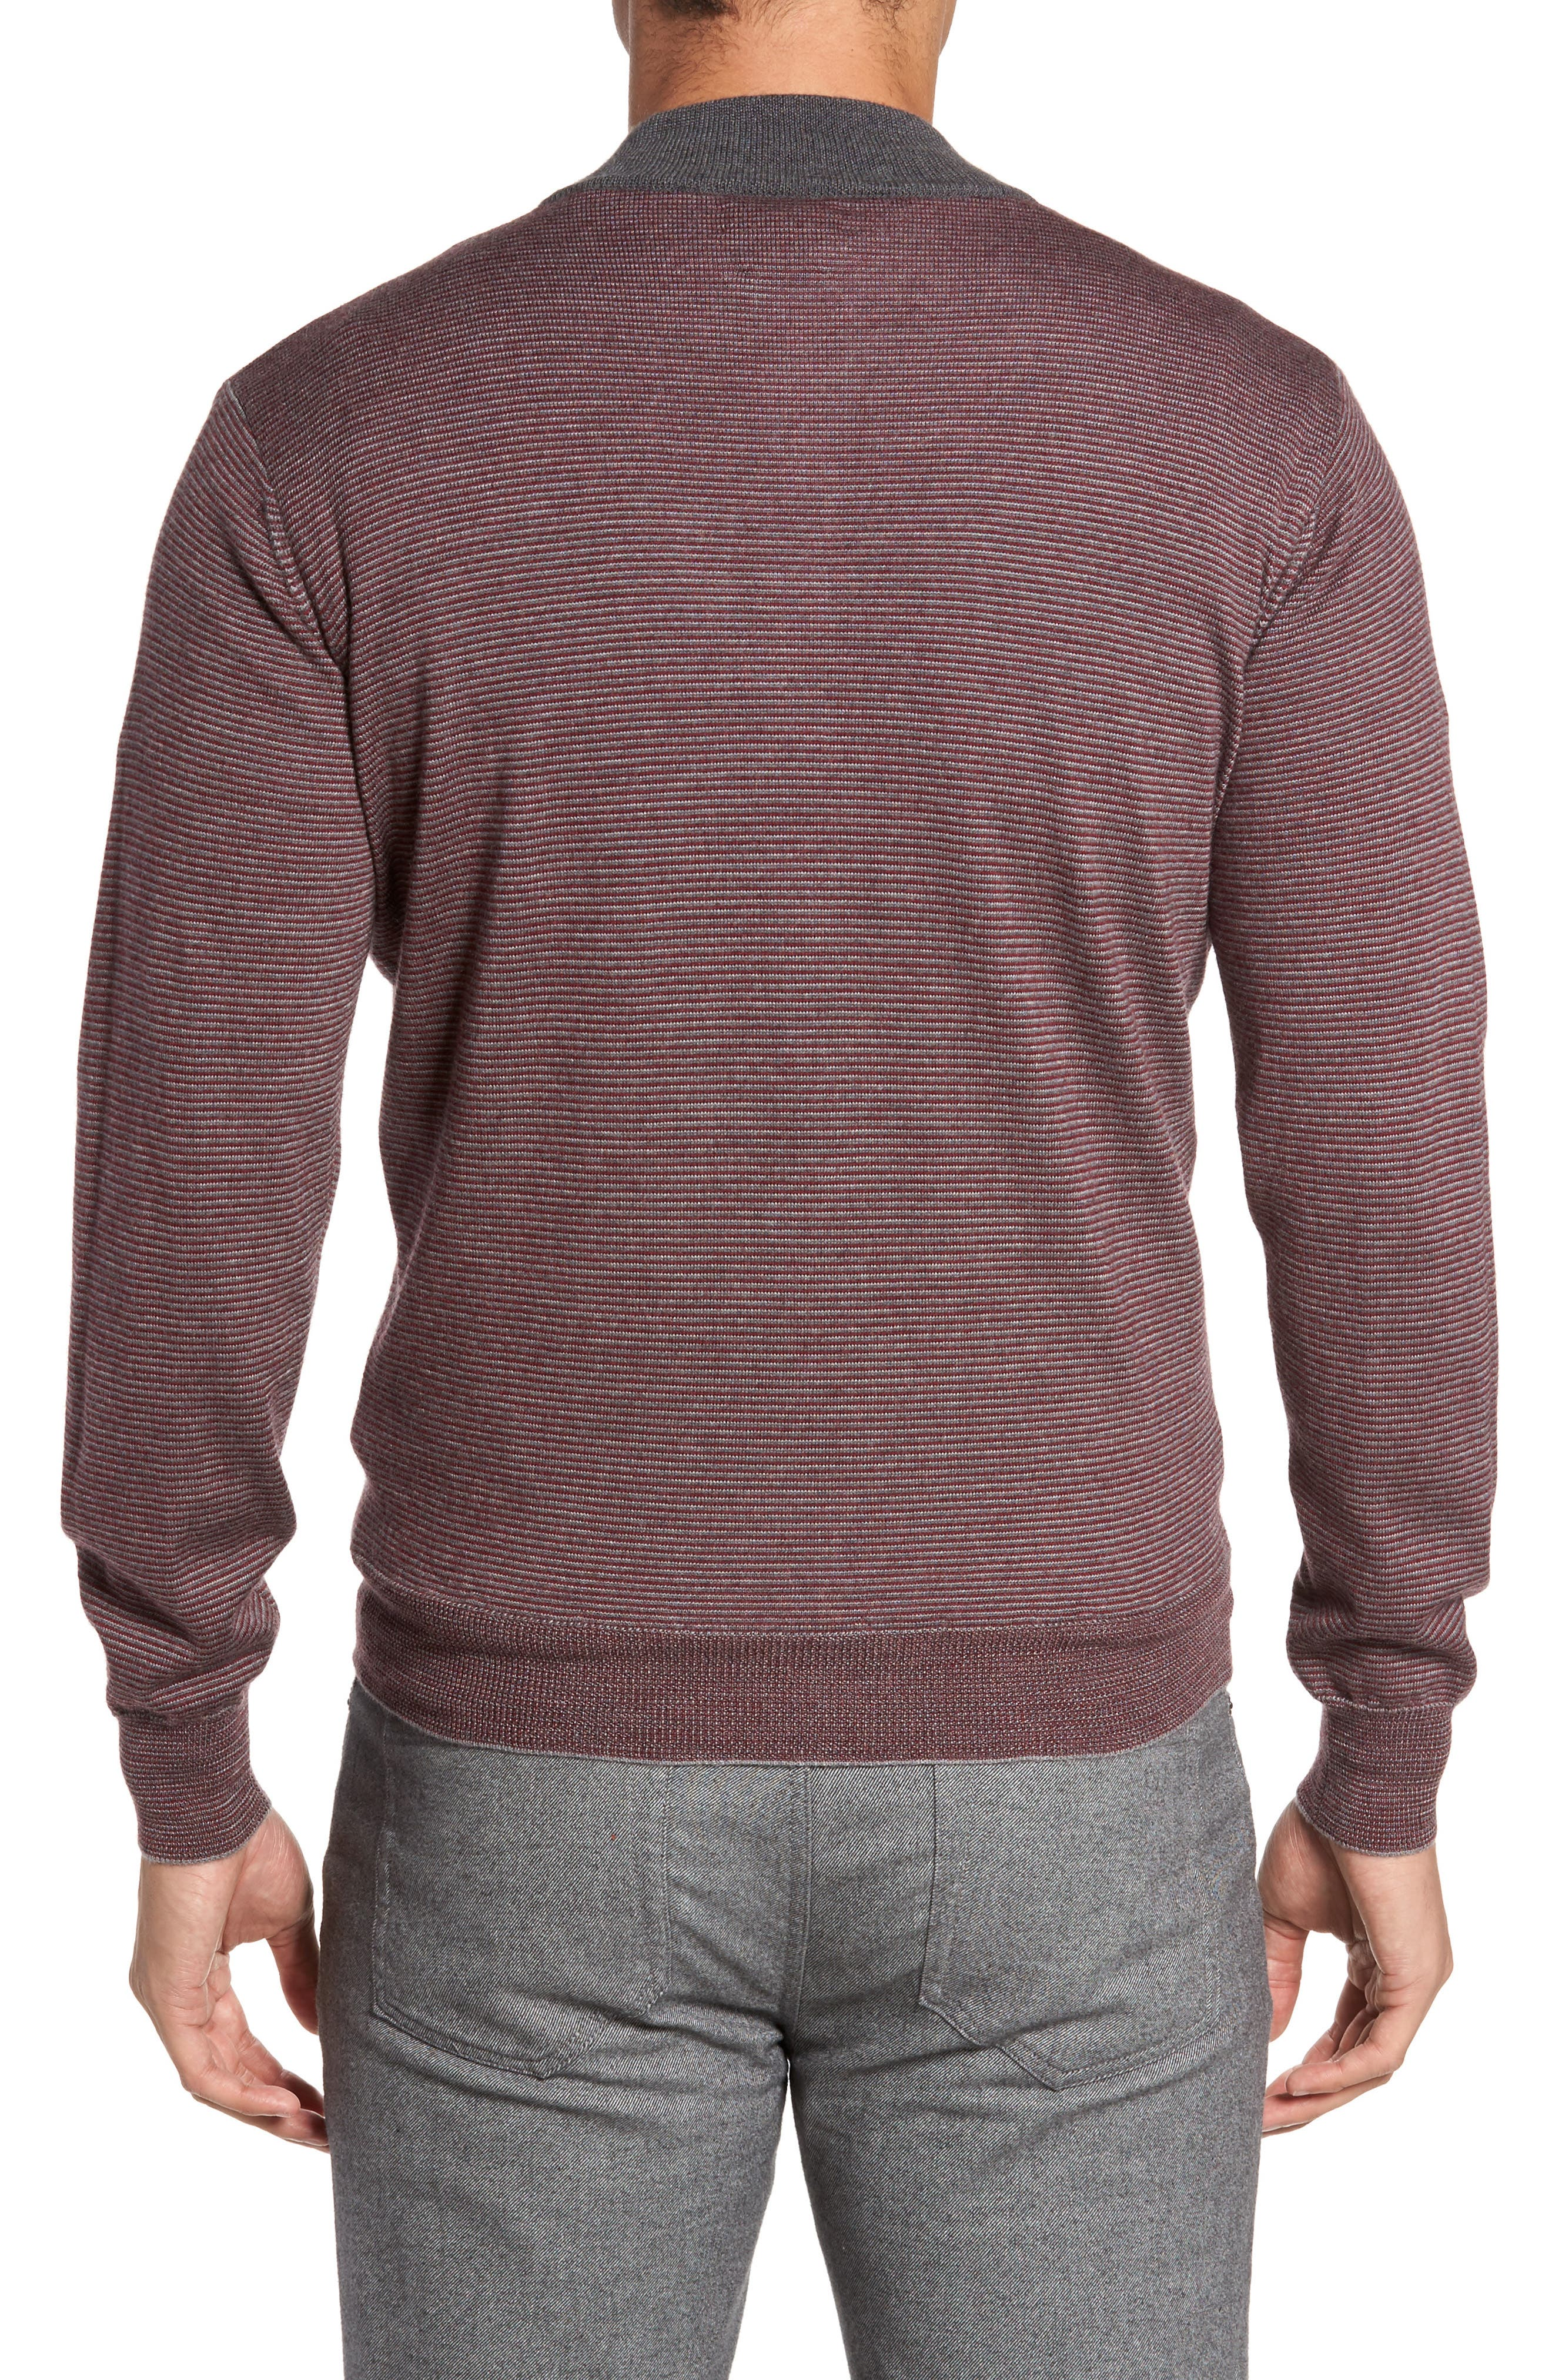 Trichrome Stripe Merino Wool Blend Sweater,                             Alternate thumbnail 2, color,                             930